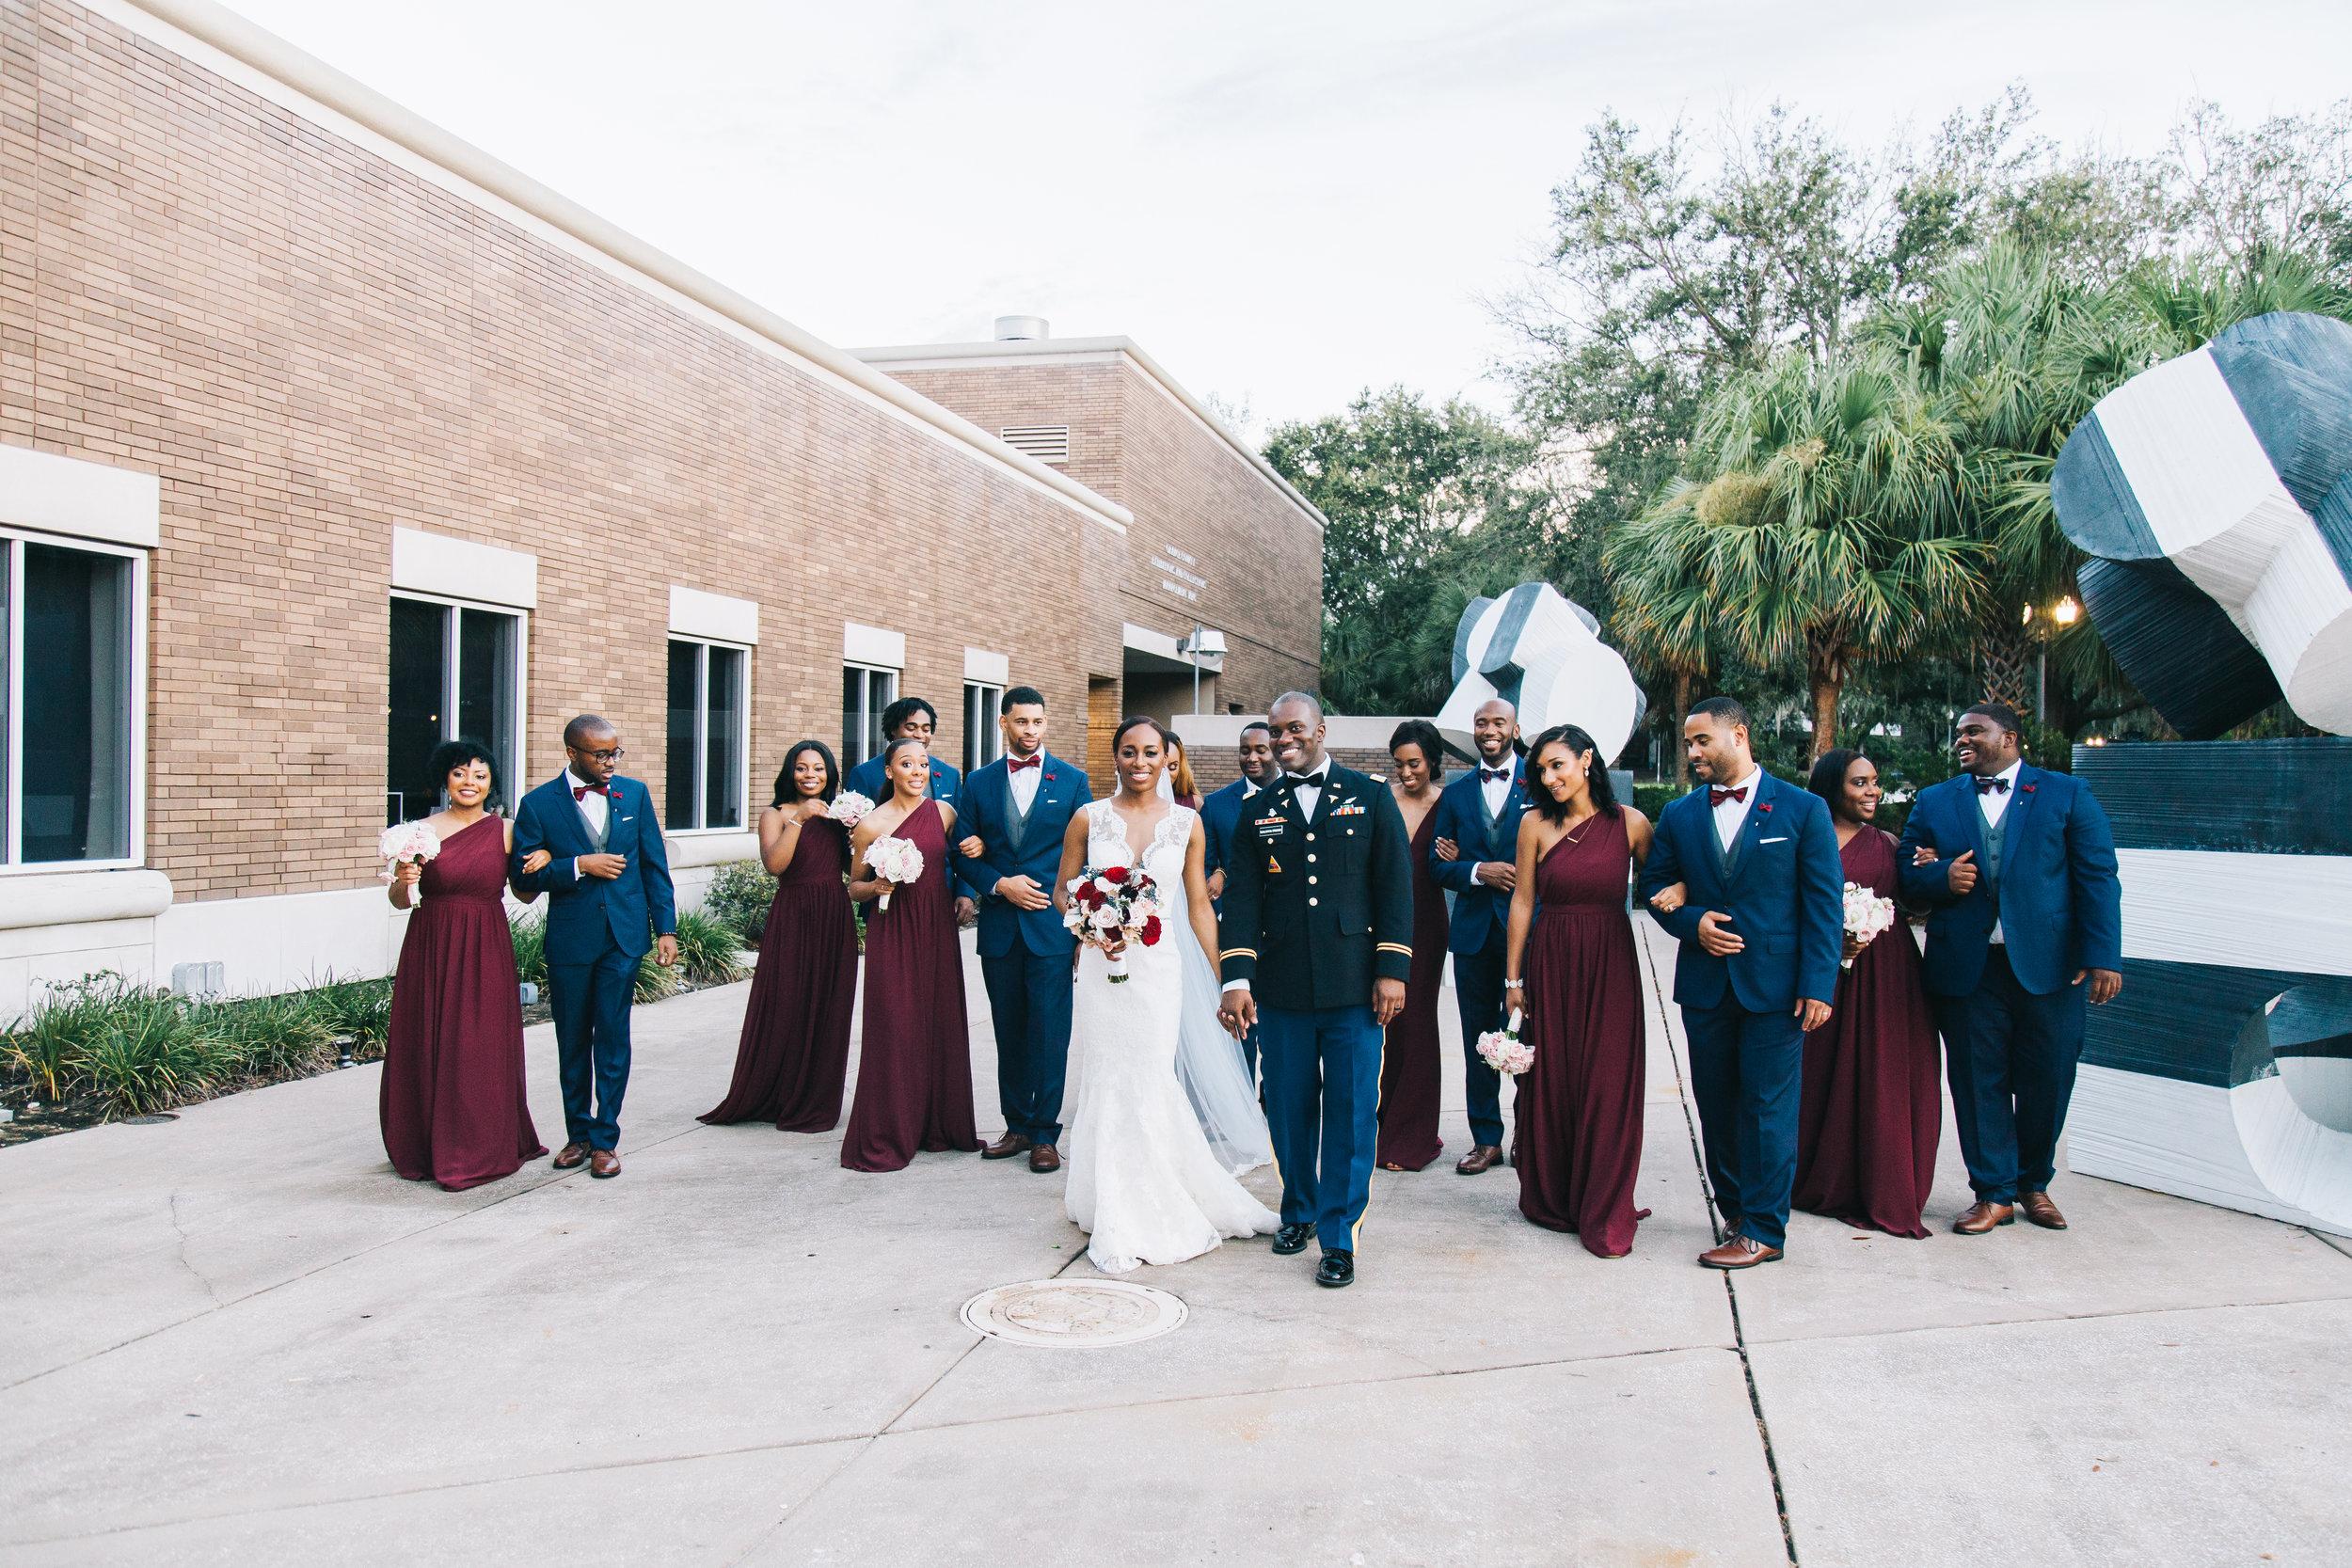 Bluegrass Chic - Gorgeous wedding party